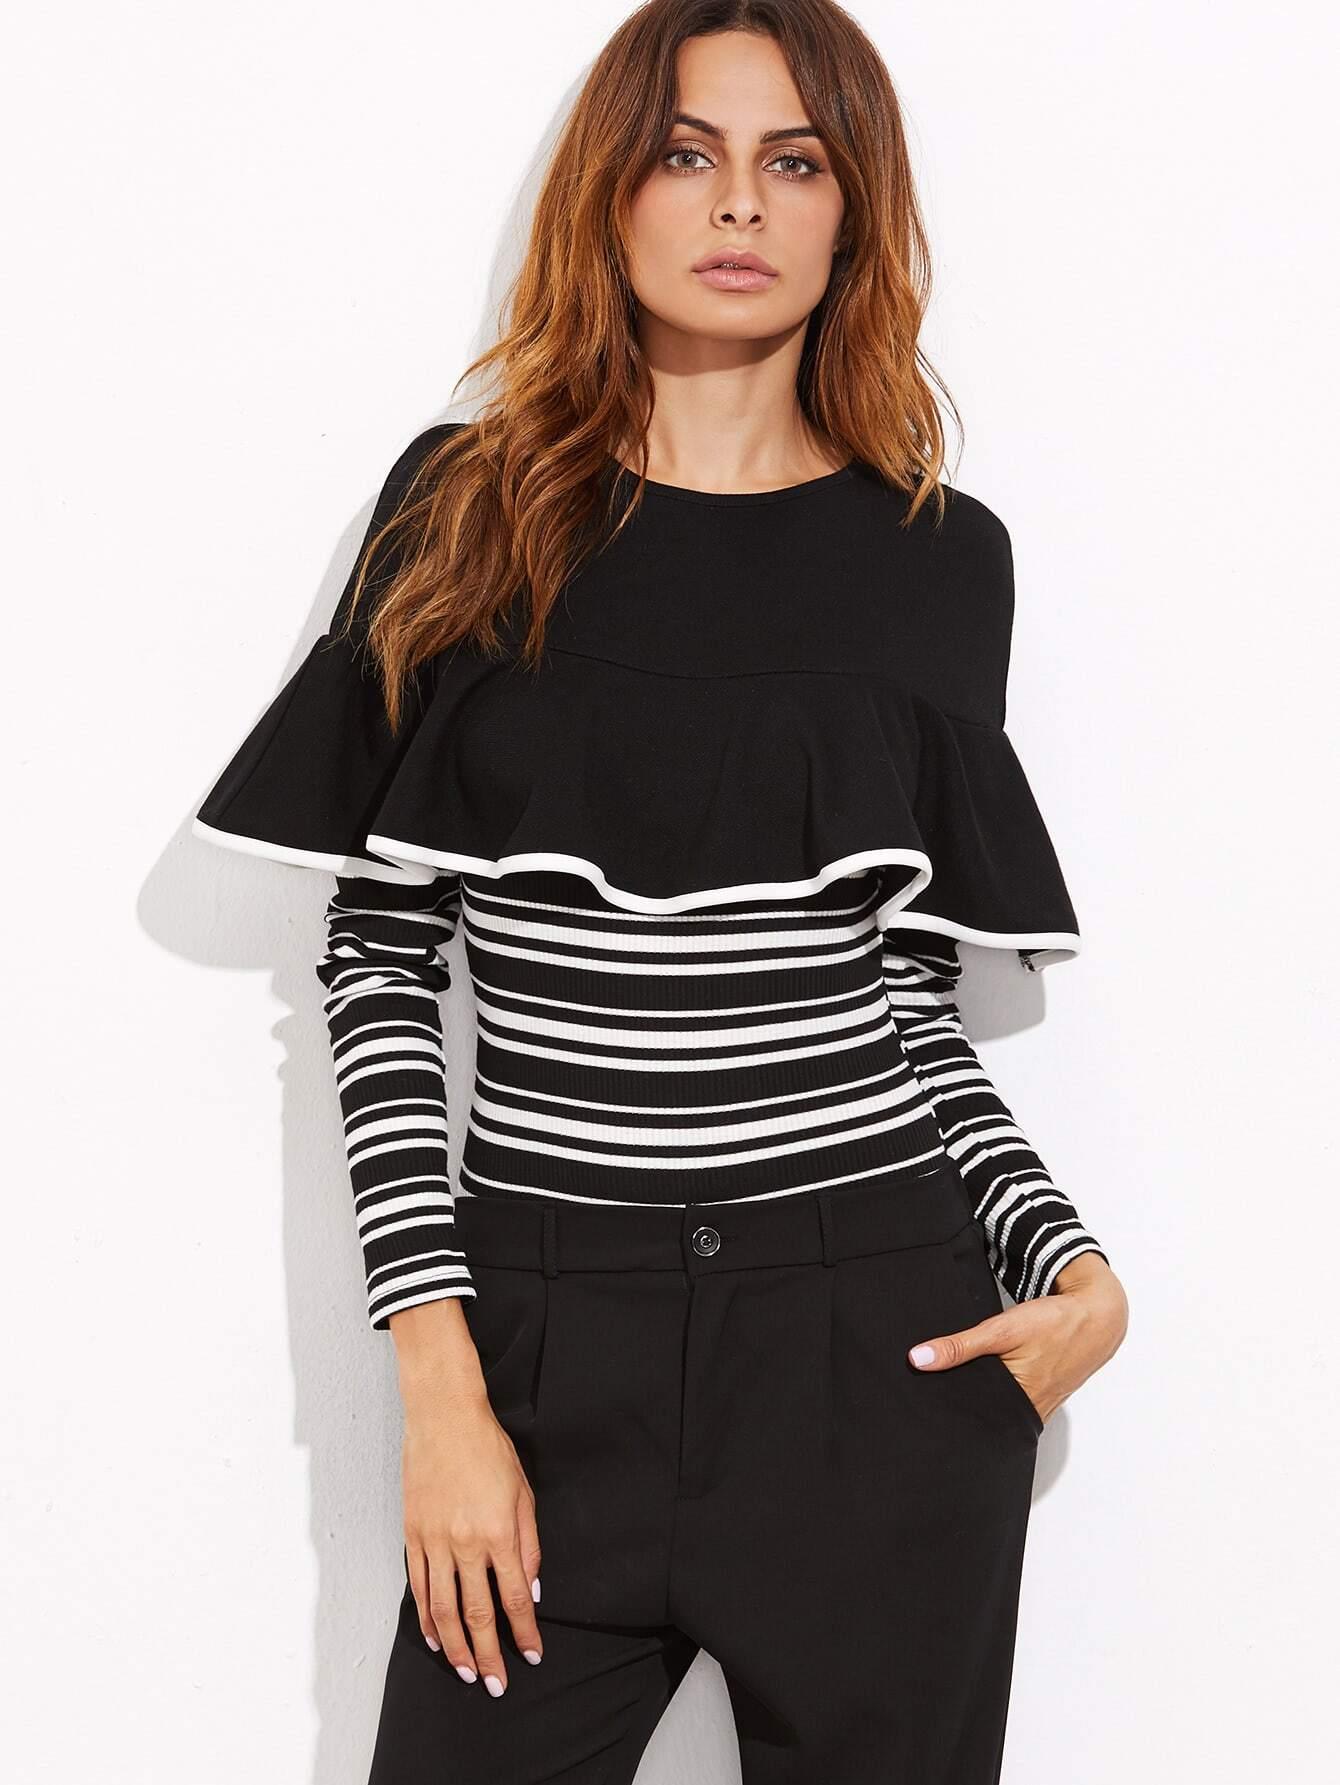 Contrast Striped Ruffle Trim Ribbed Bodysuit bodysuit161024702